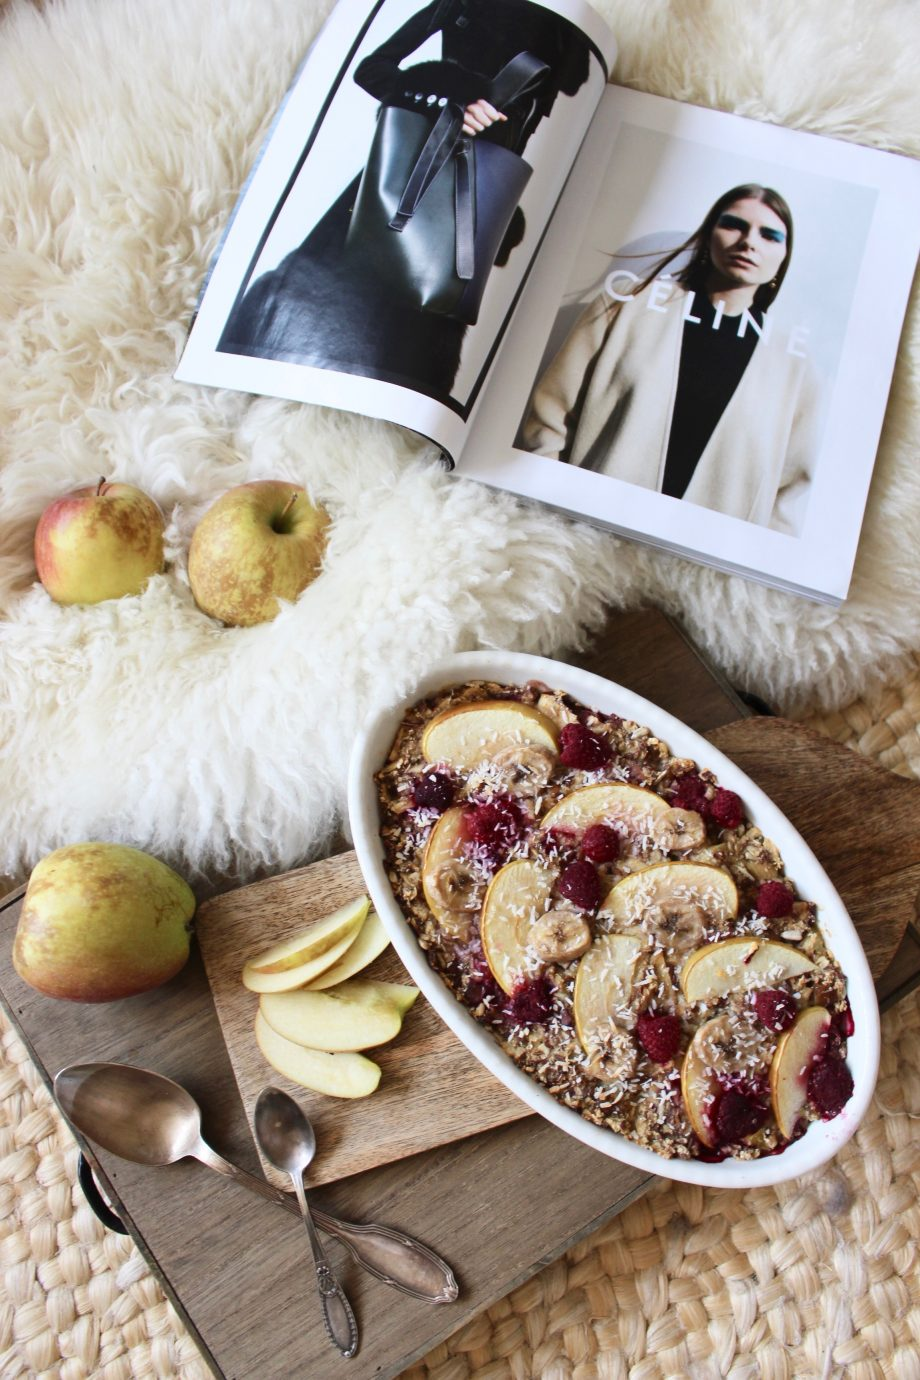 Ofen Porridge mit Rhabarber & Apfel |18.04.2018